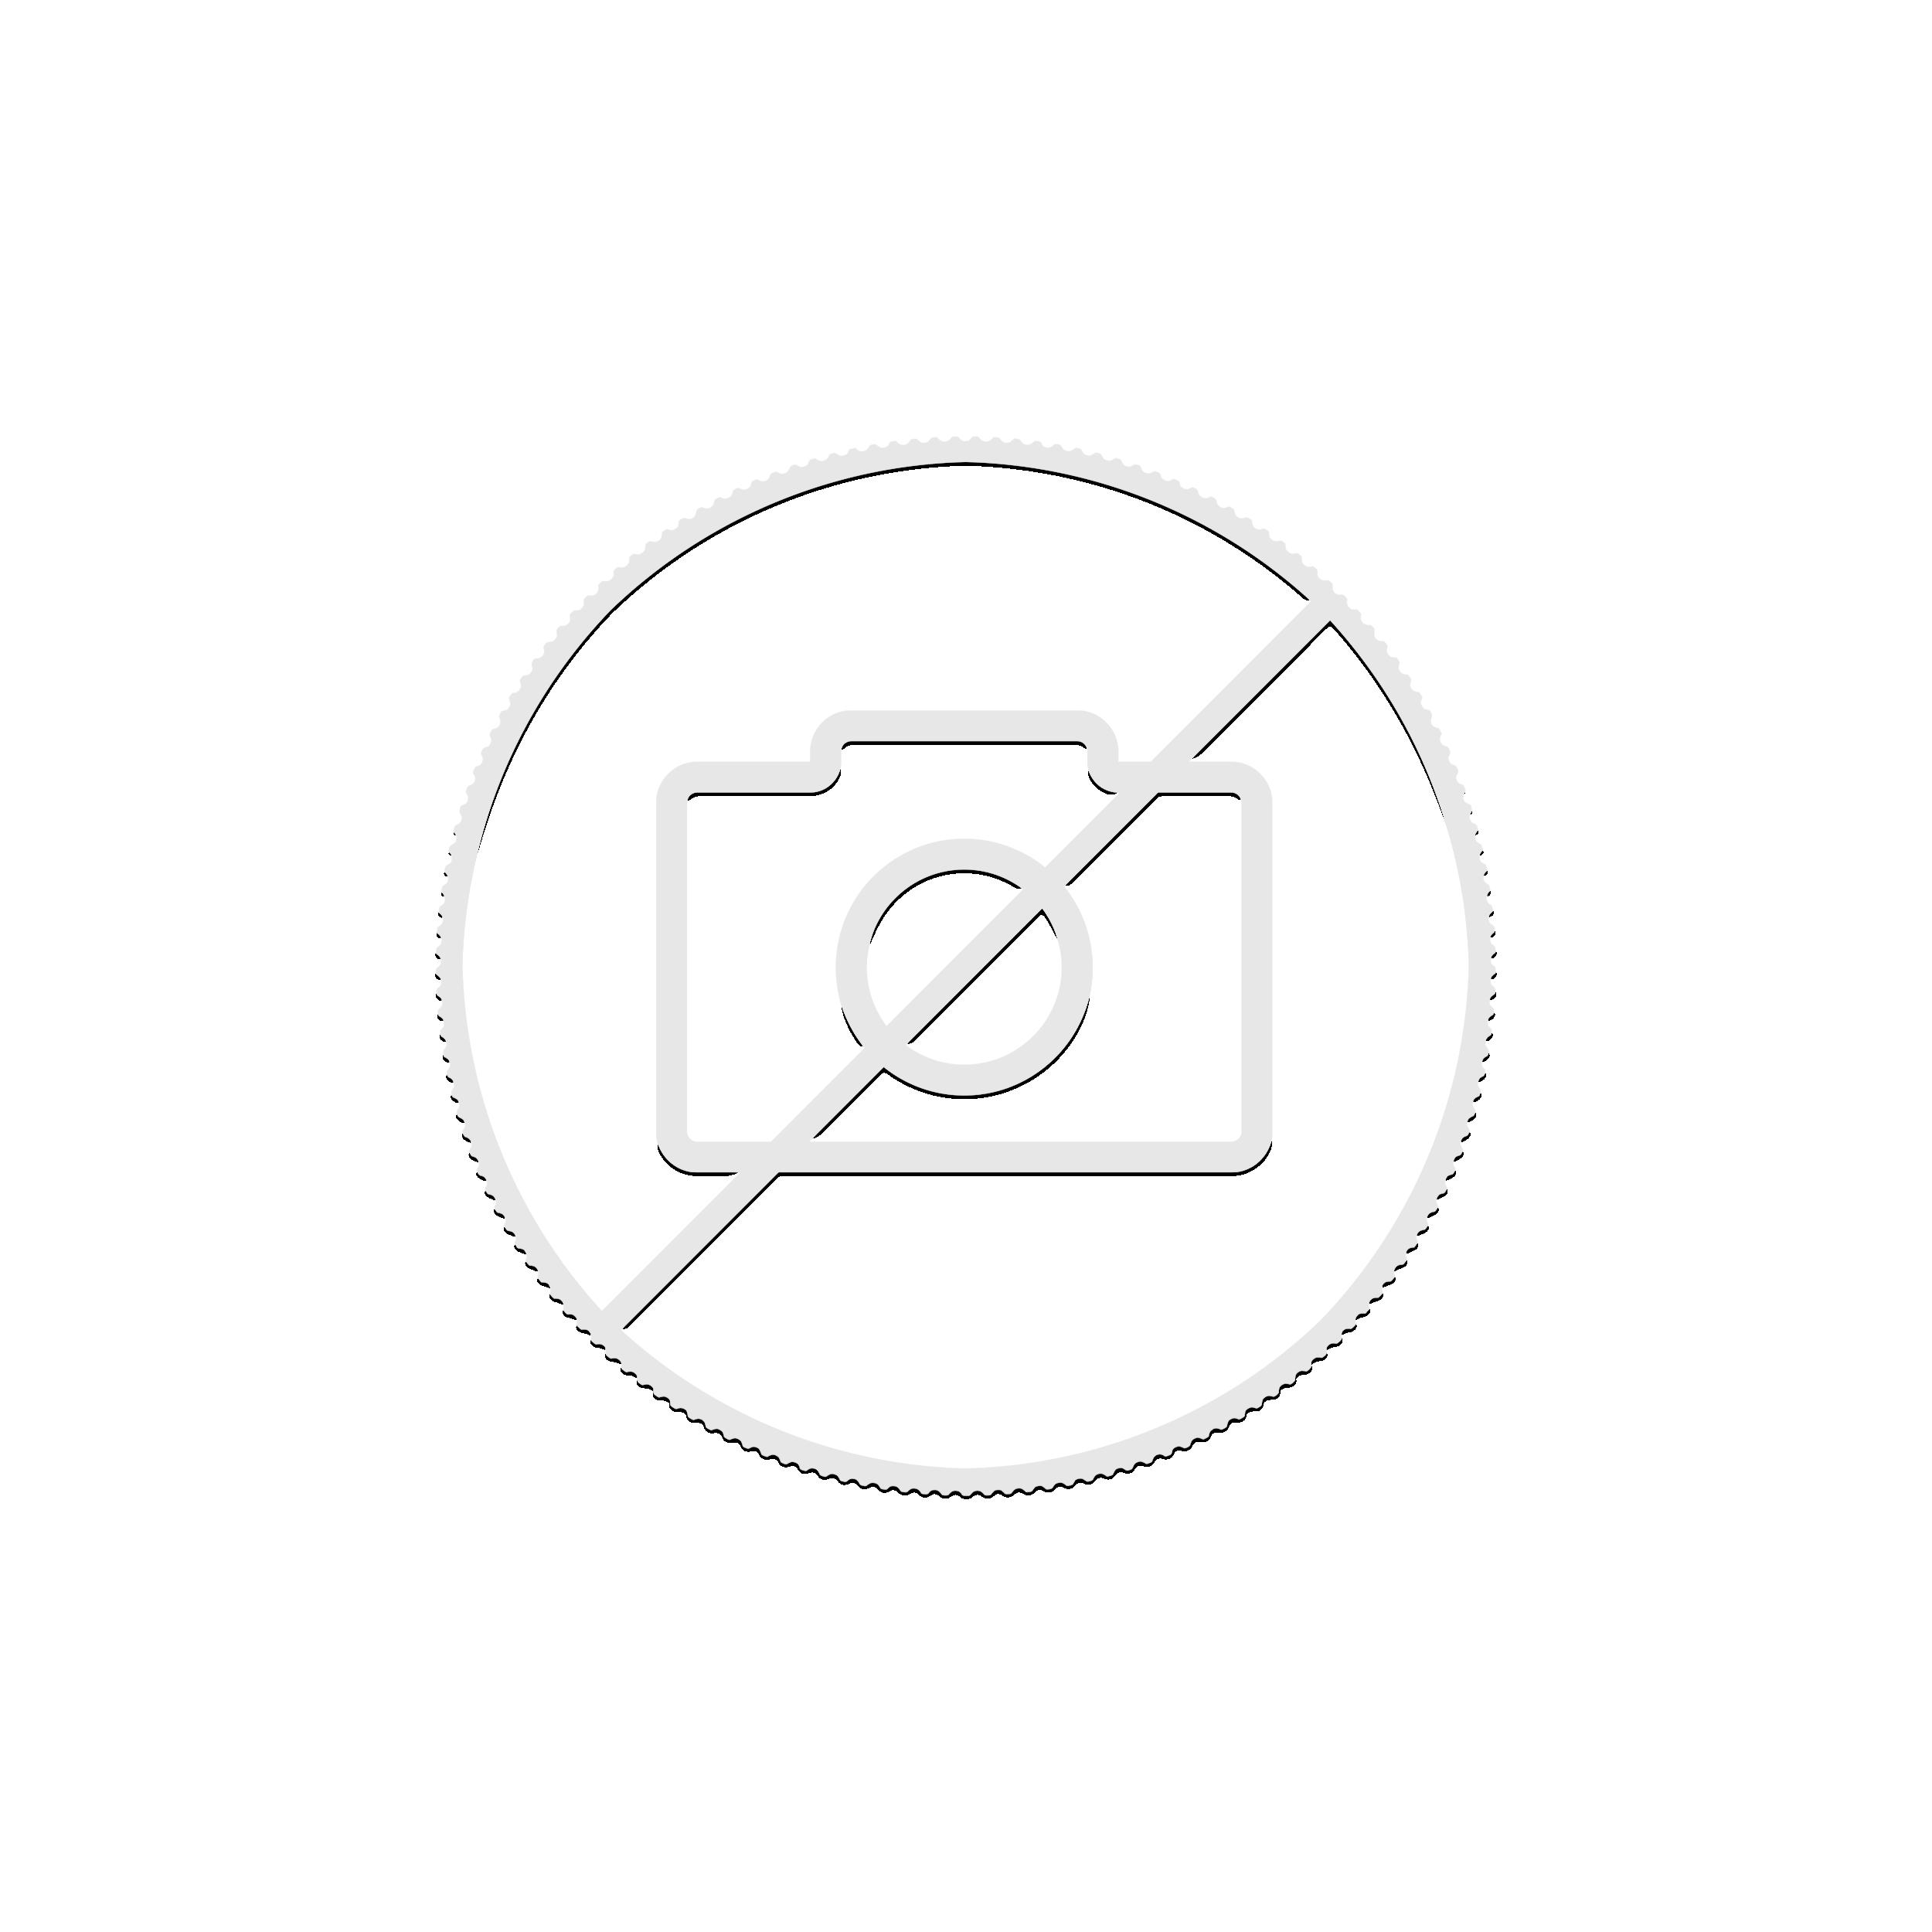 Britannia 1/10 troy ounce gold coin 2022